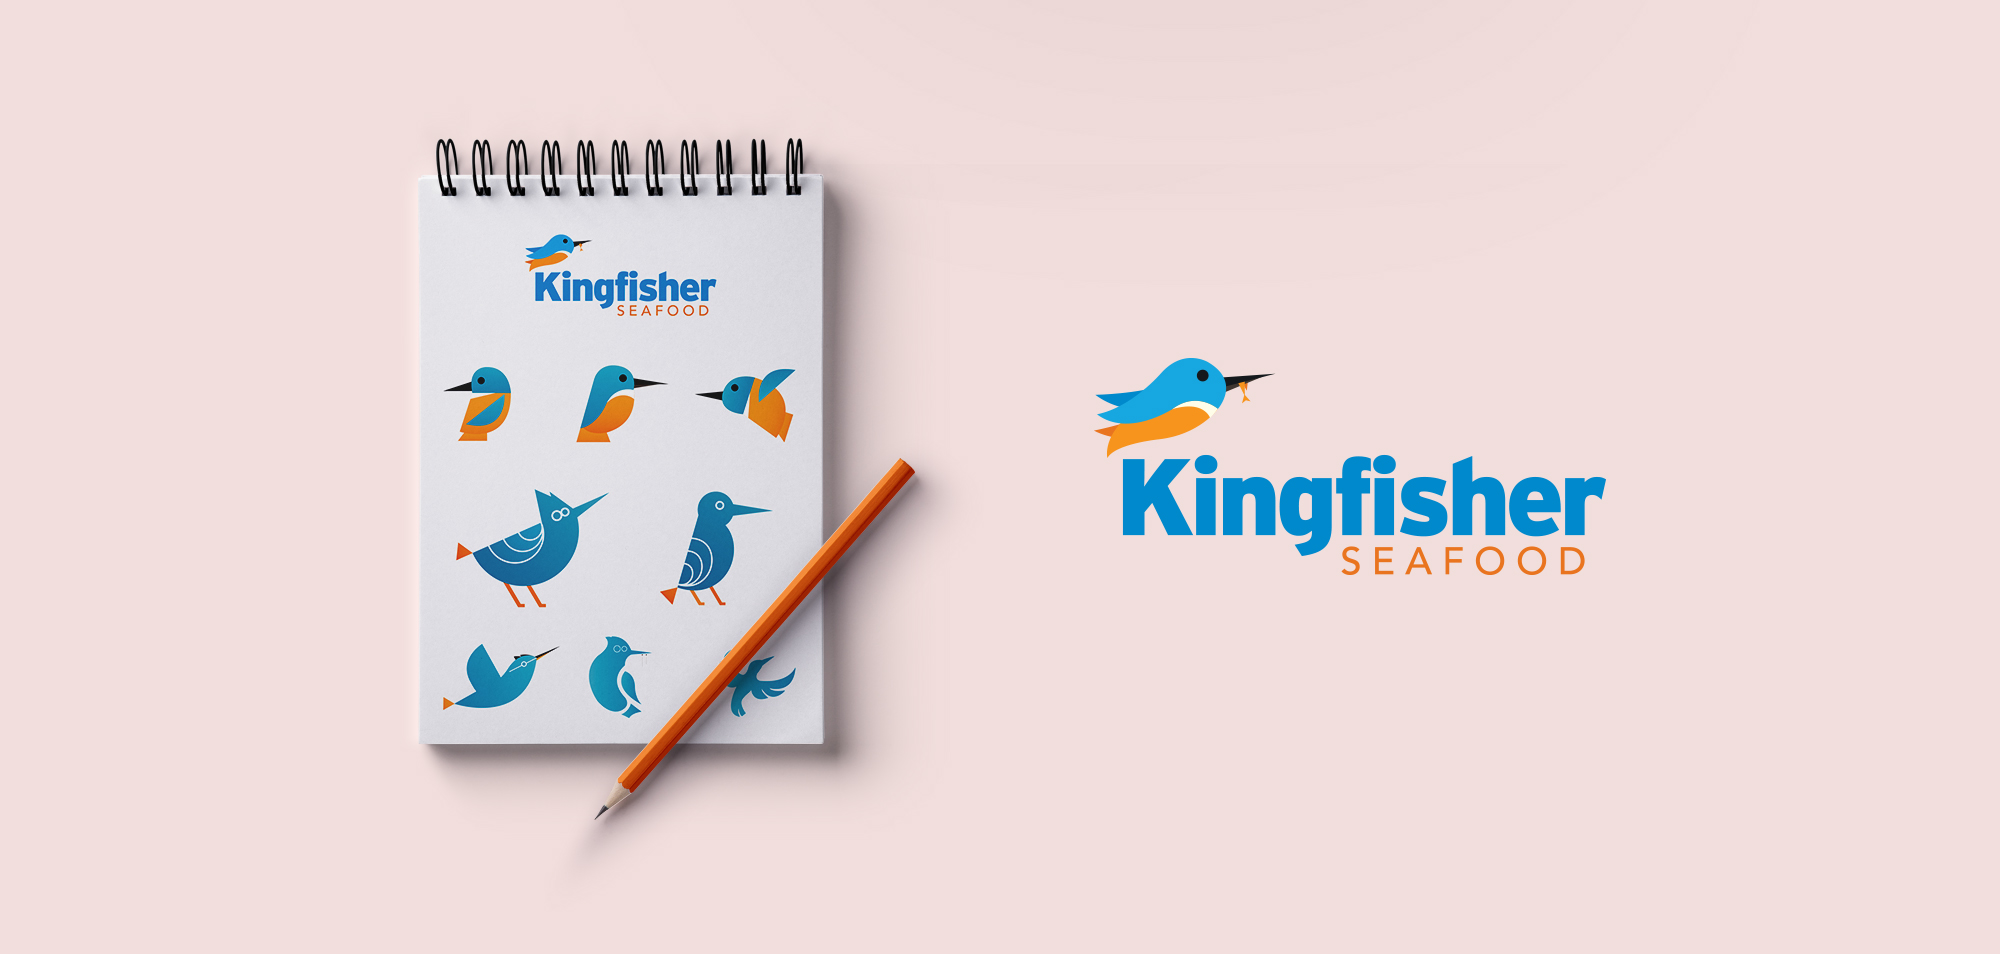 Kingfisher-Seafood